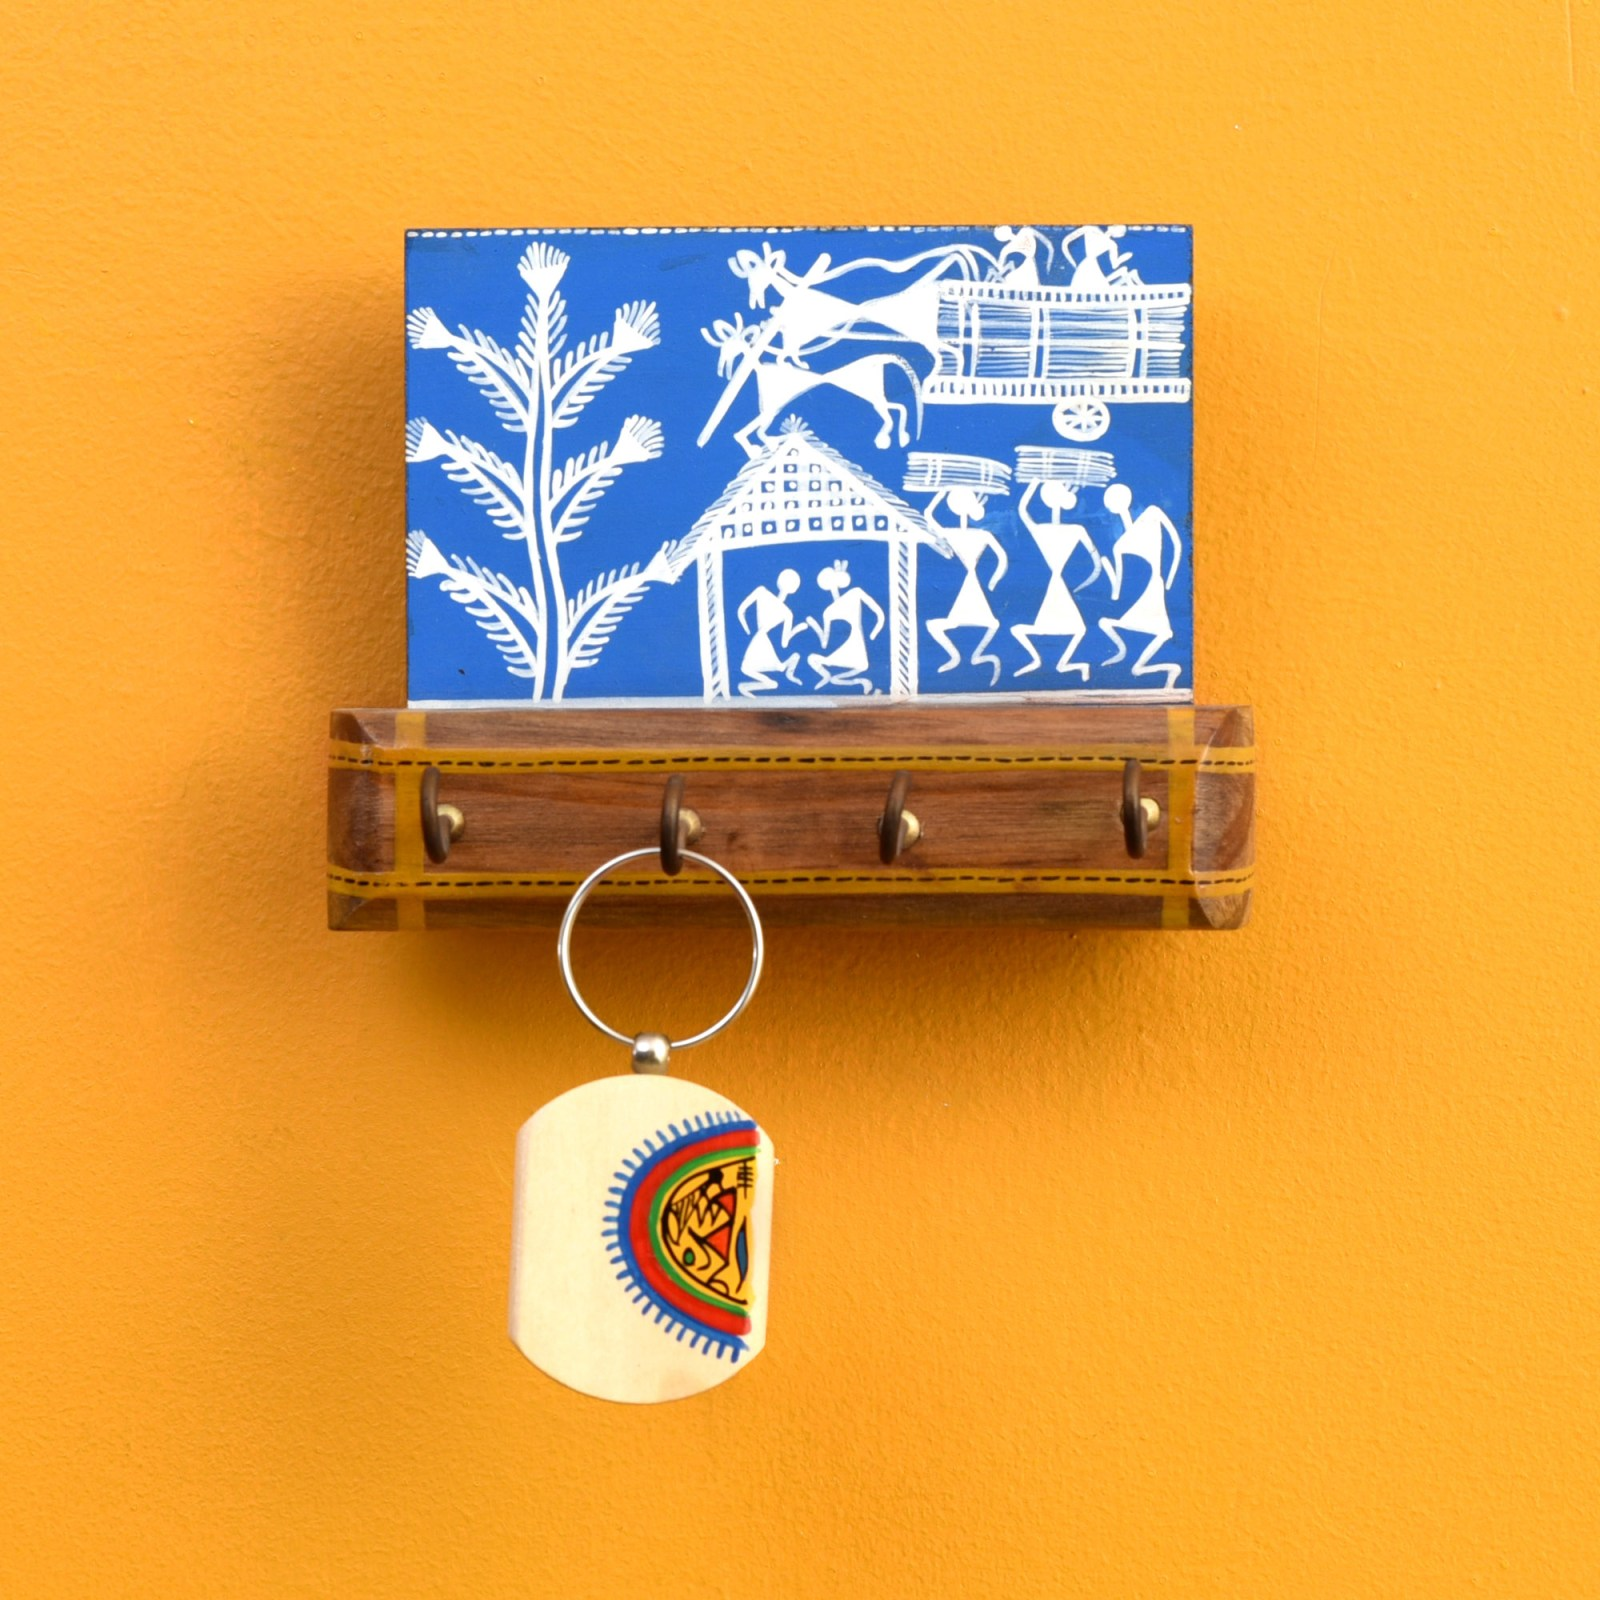 Handcrafted Key Hanger